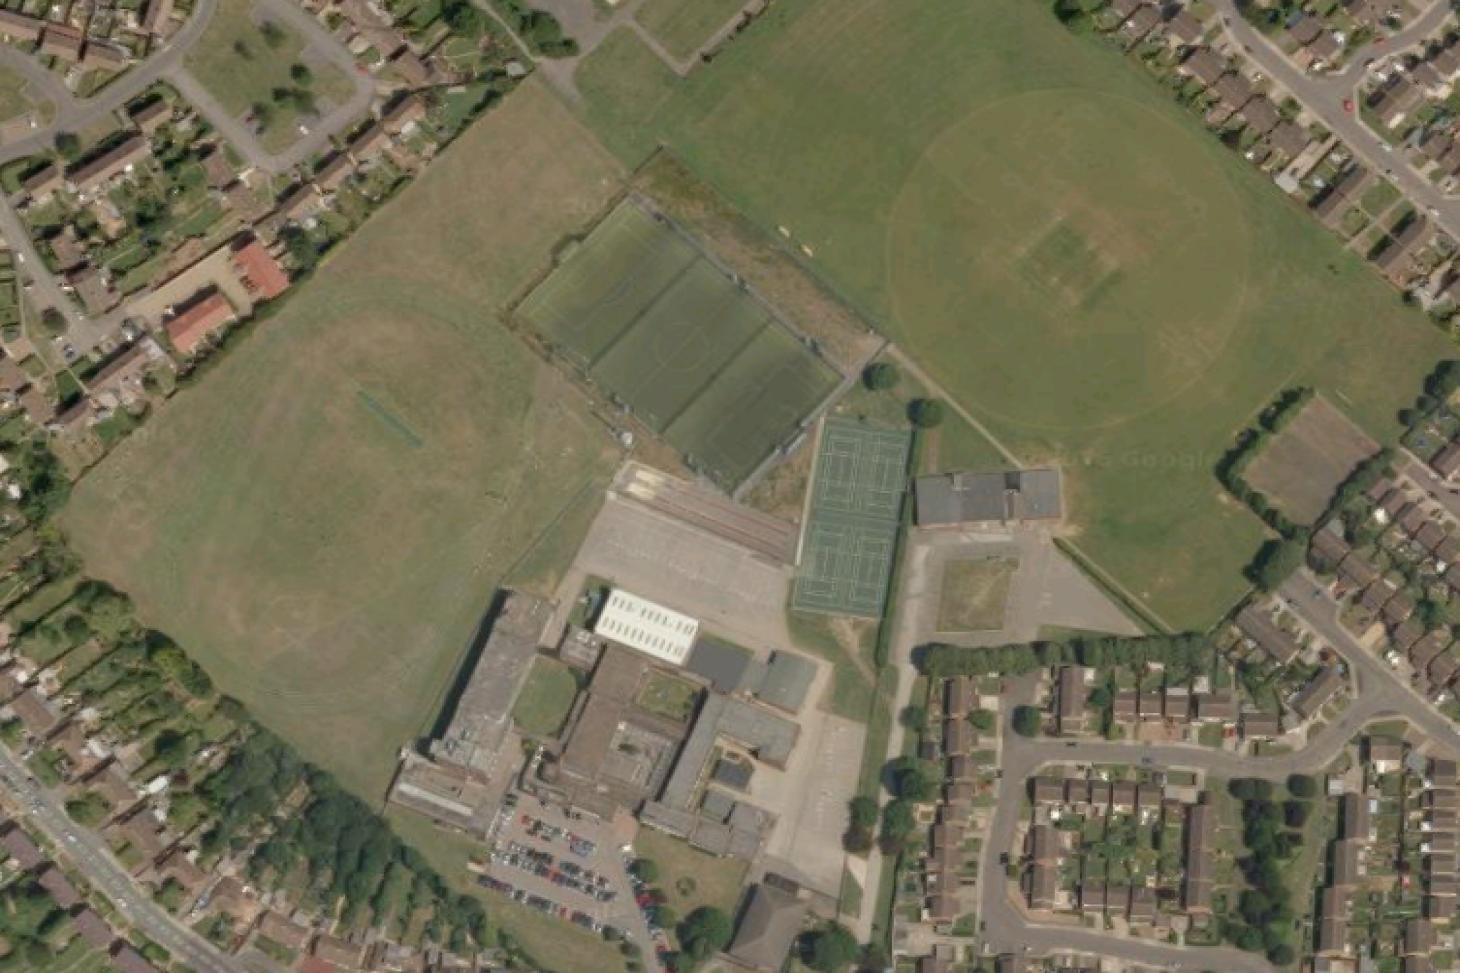 Ashcroft High School Union | Grass rugby pitch